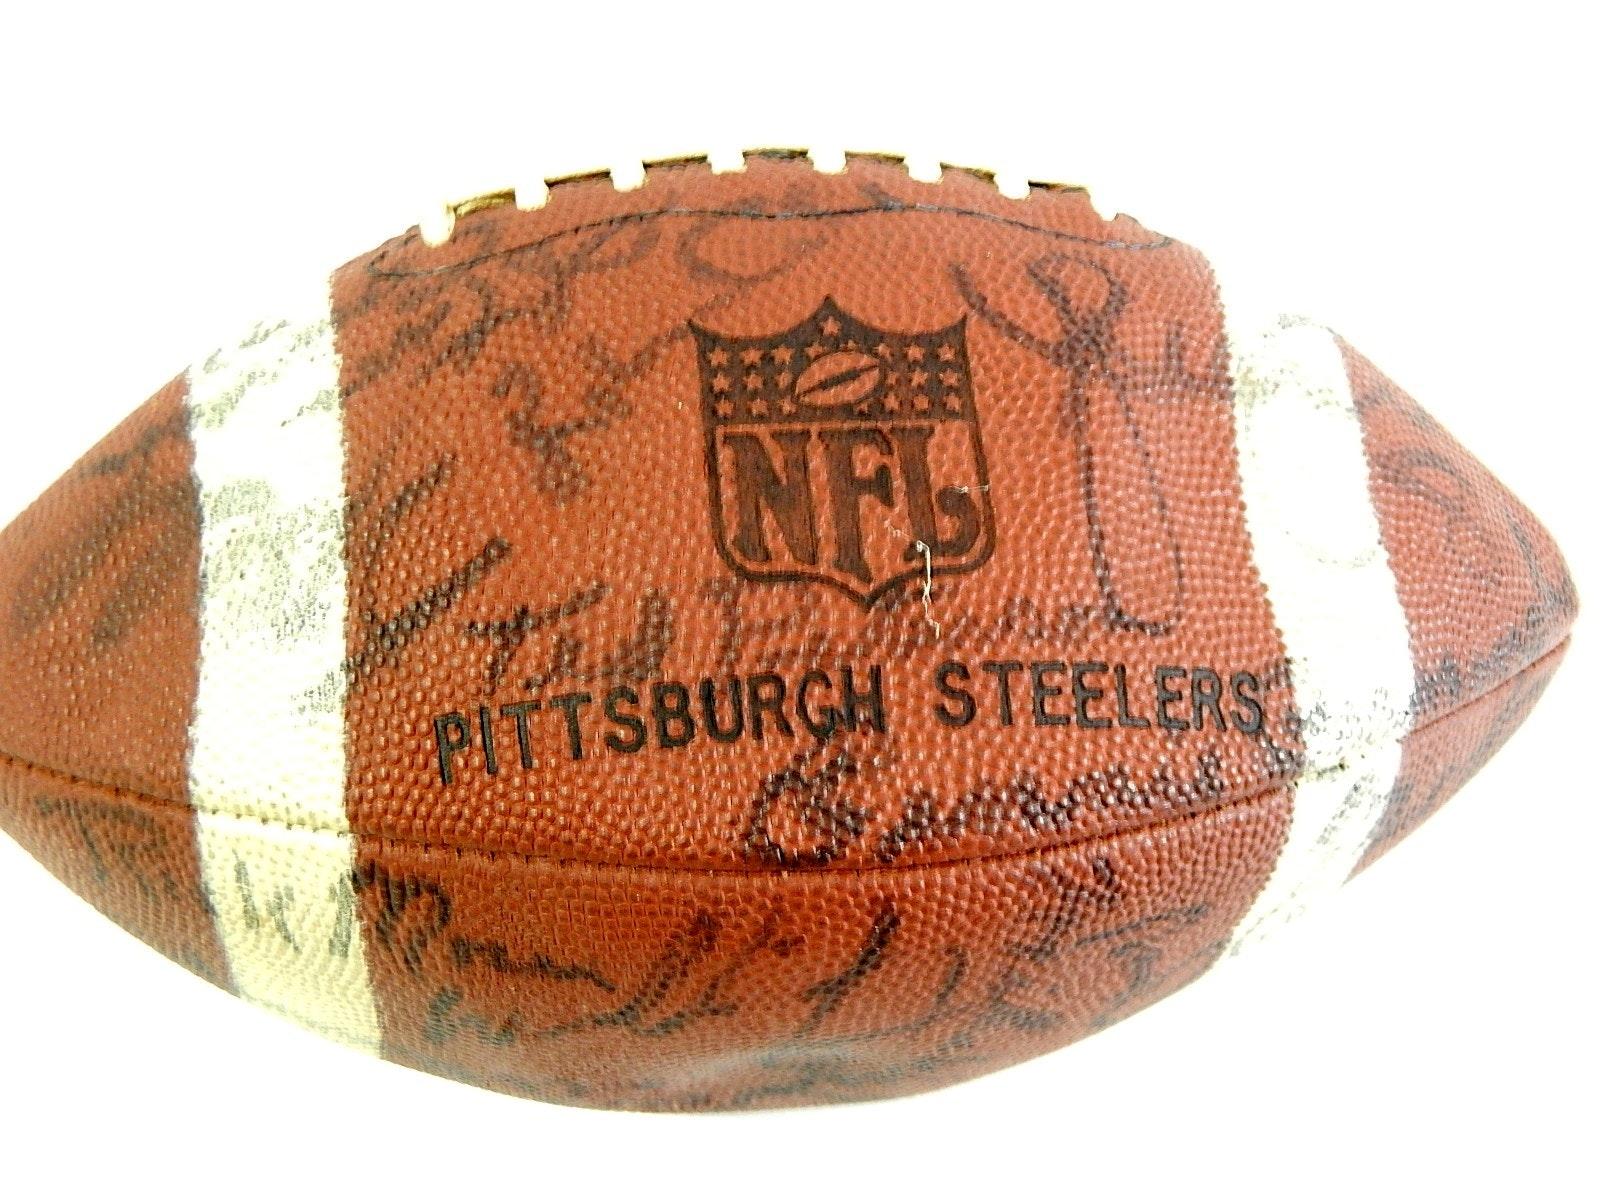 1970s Era Pittsburgh Steelers Signed Football - Bradshaw, Swann, Webster